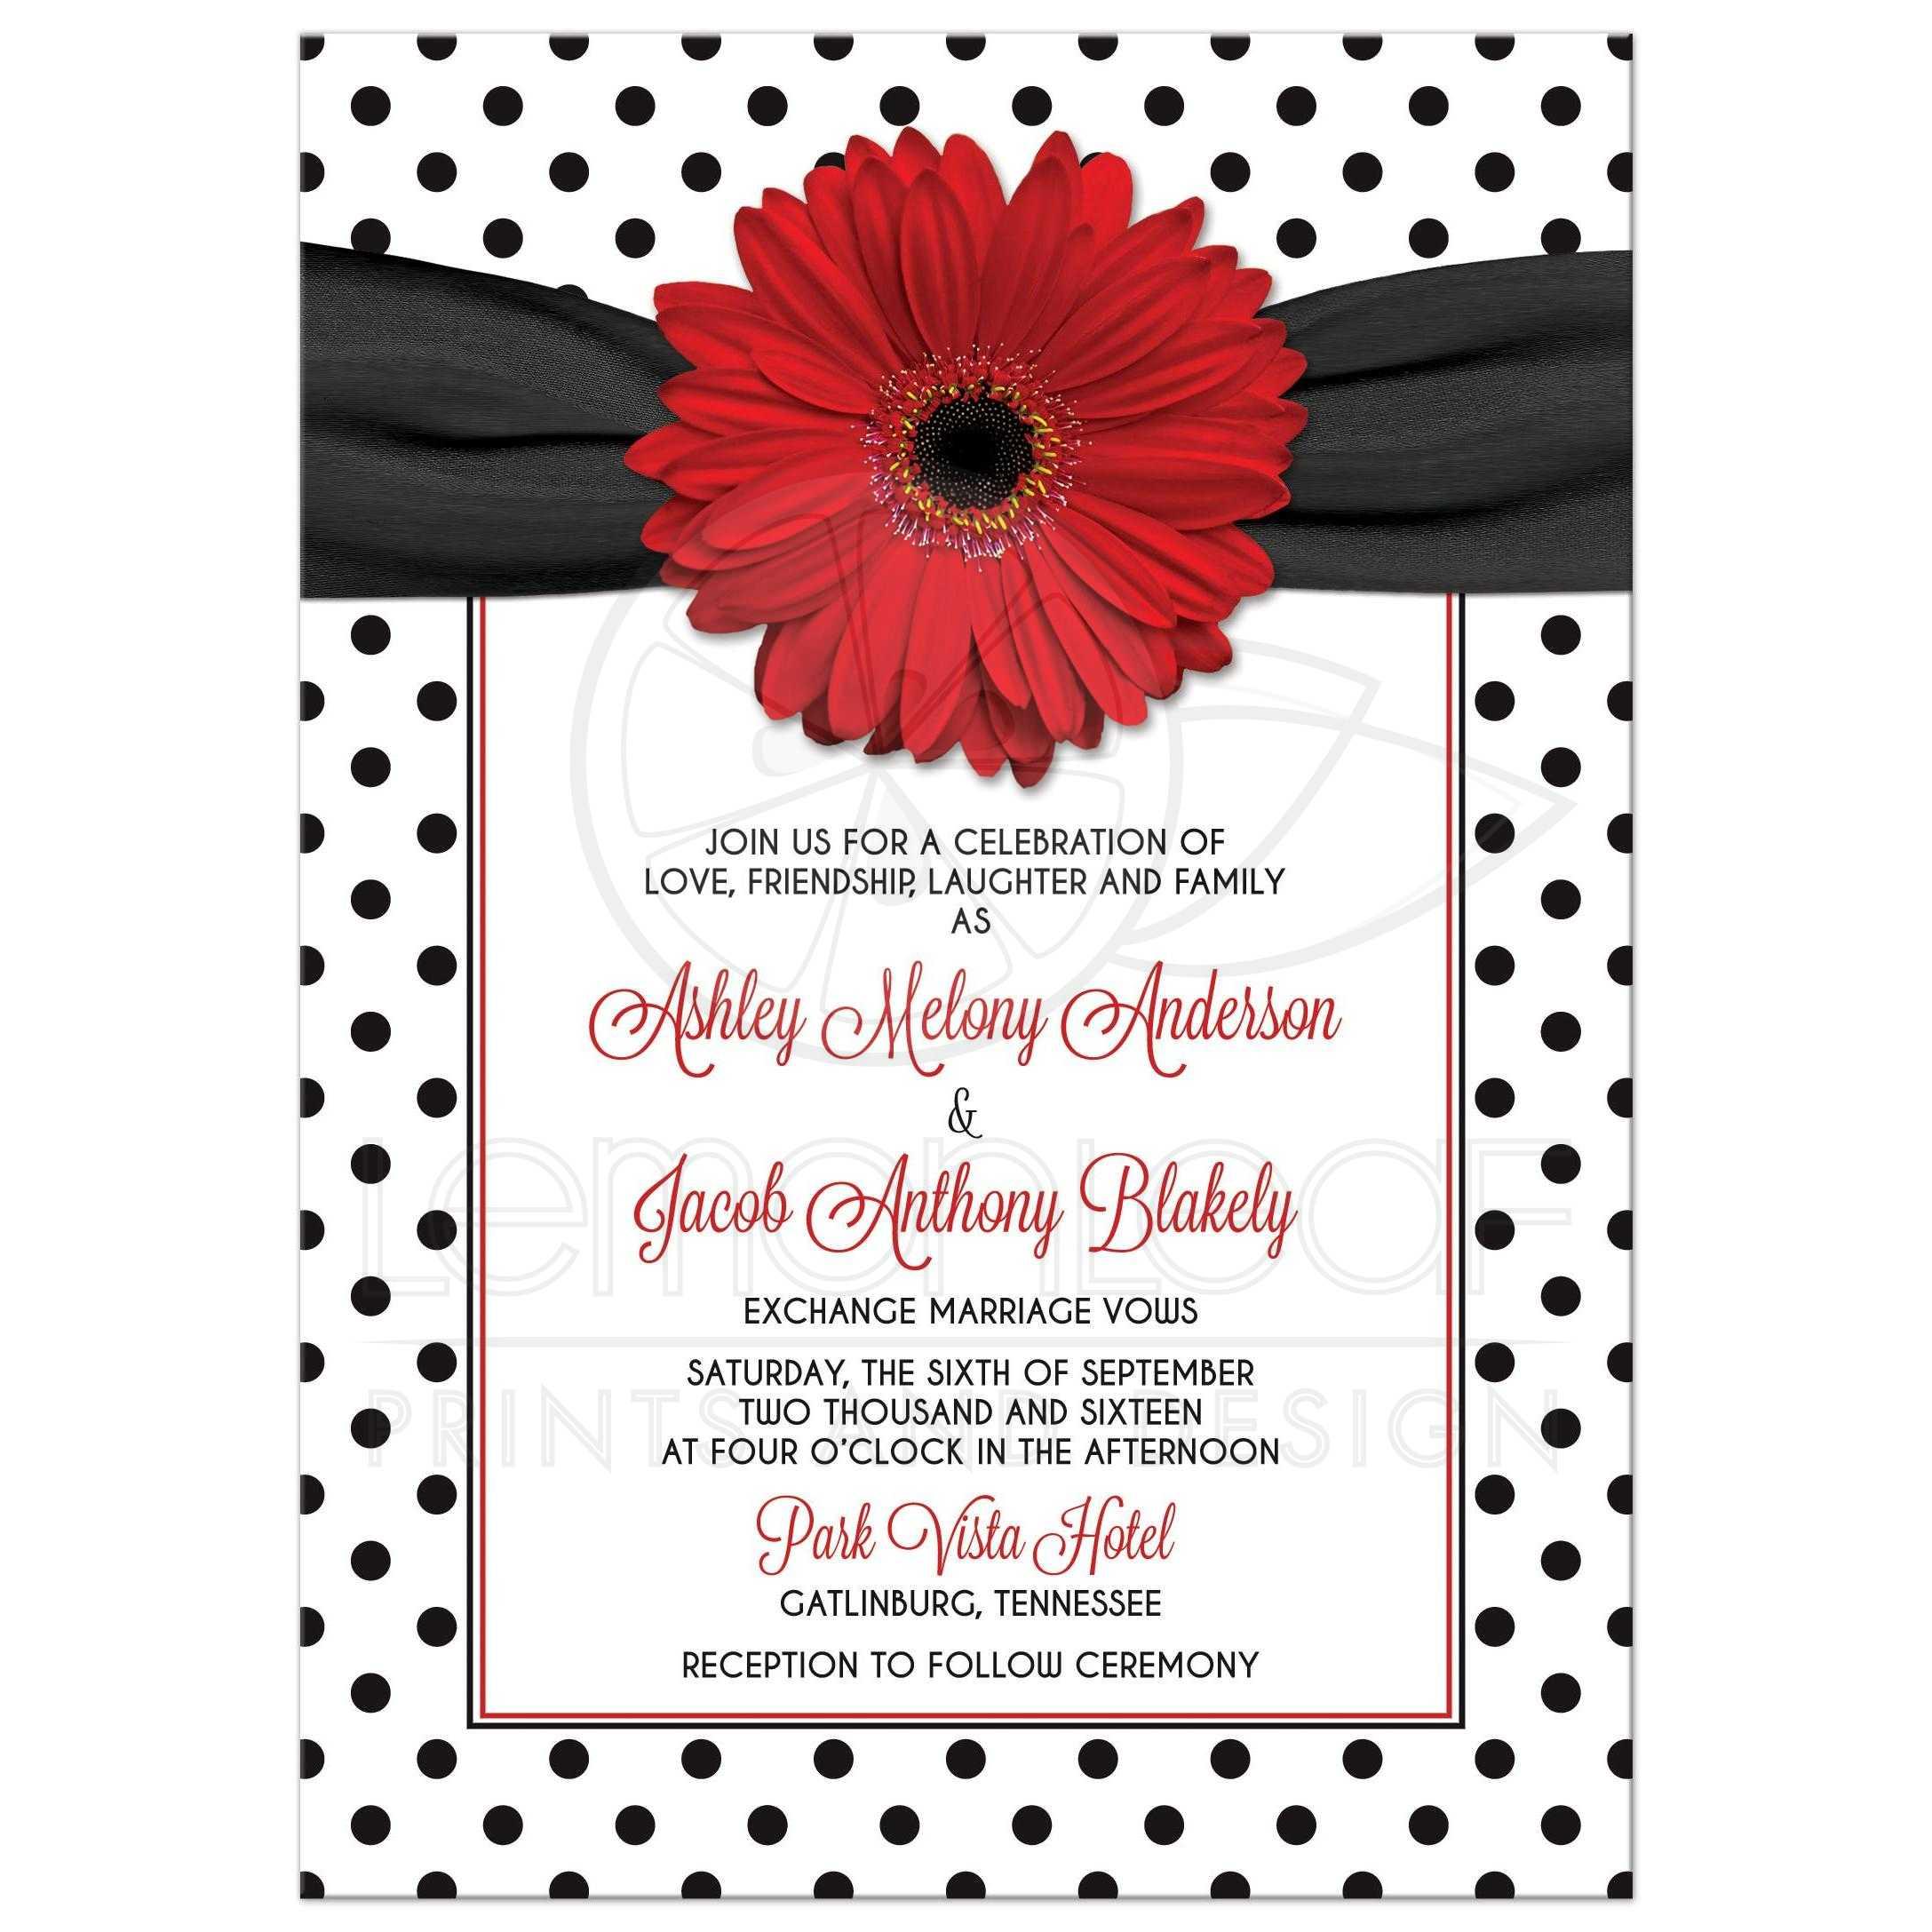 Retro Red Gerbera Daisy, Black And White Polka Dot And Ribbon Wedding  Invitation Front ...